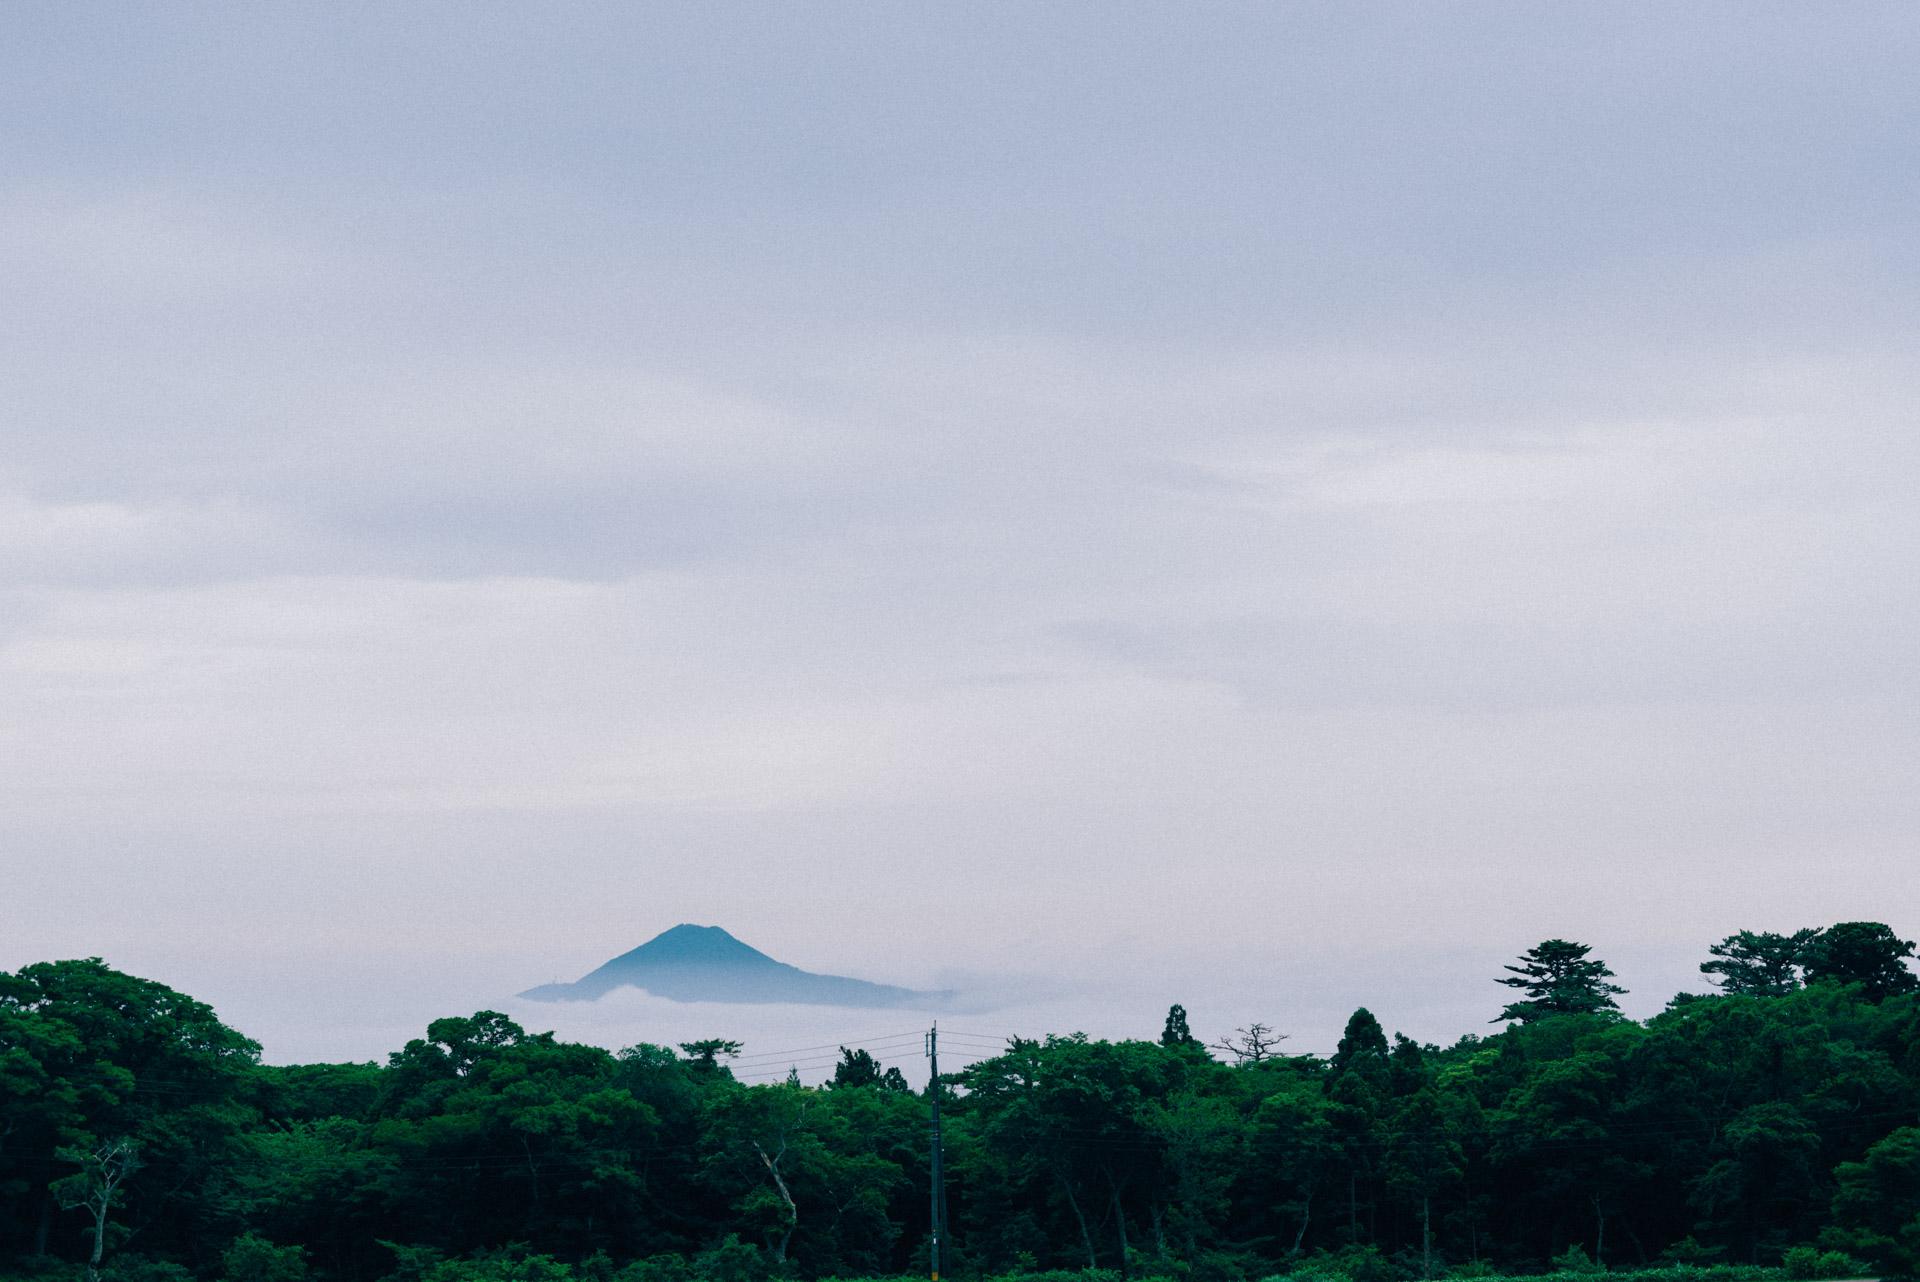 中国最高峰、大山の麓で。【日本一周76日目2018.06.10(No.206)】